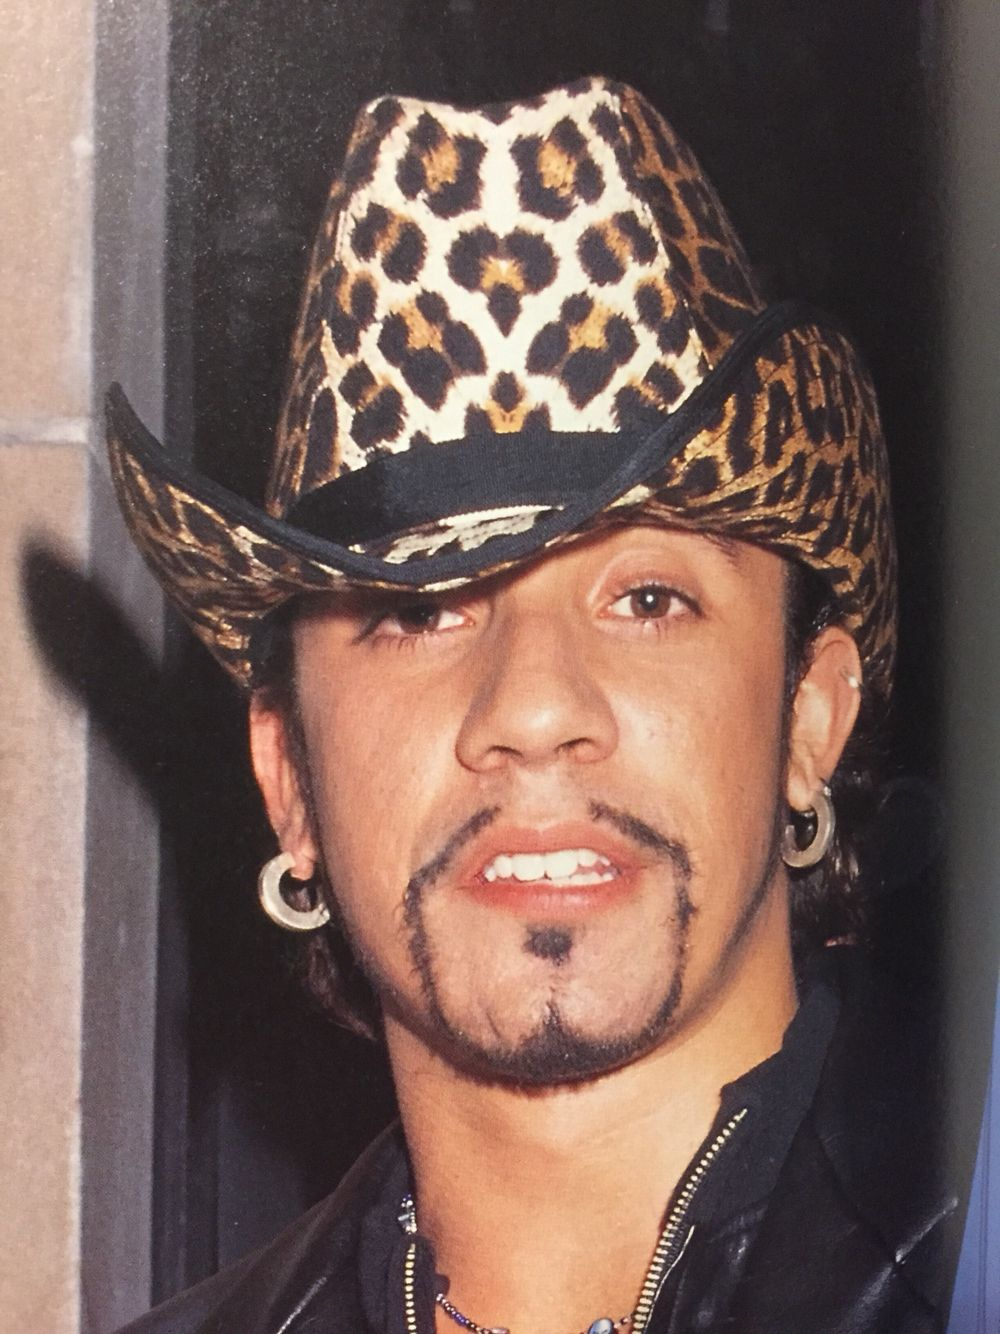 A young aj 1999 backstreet boys singer boys